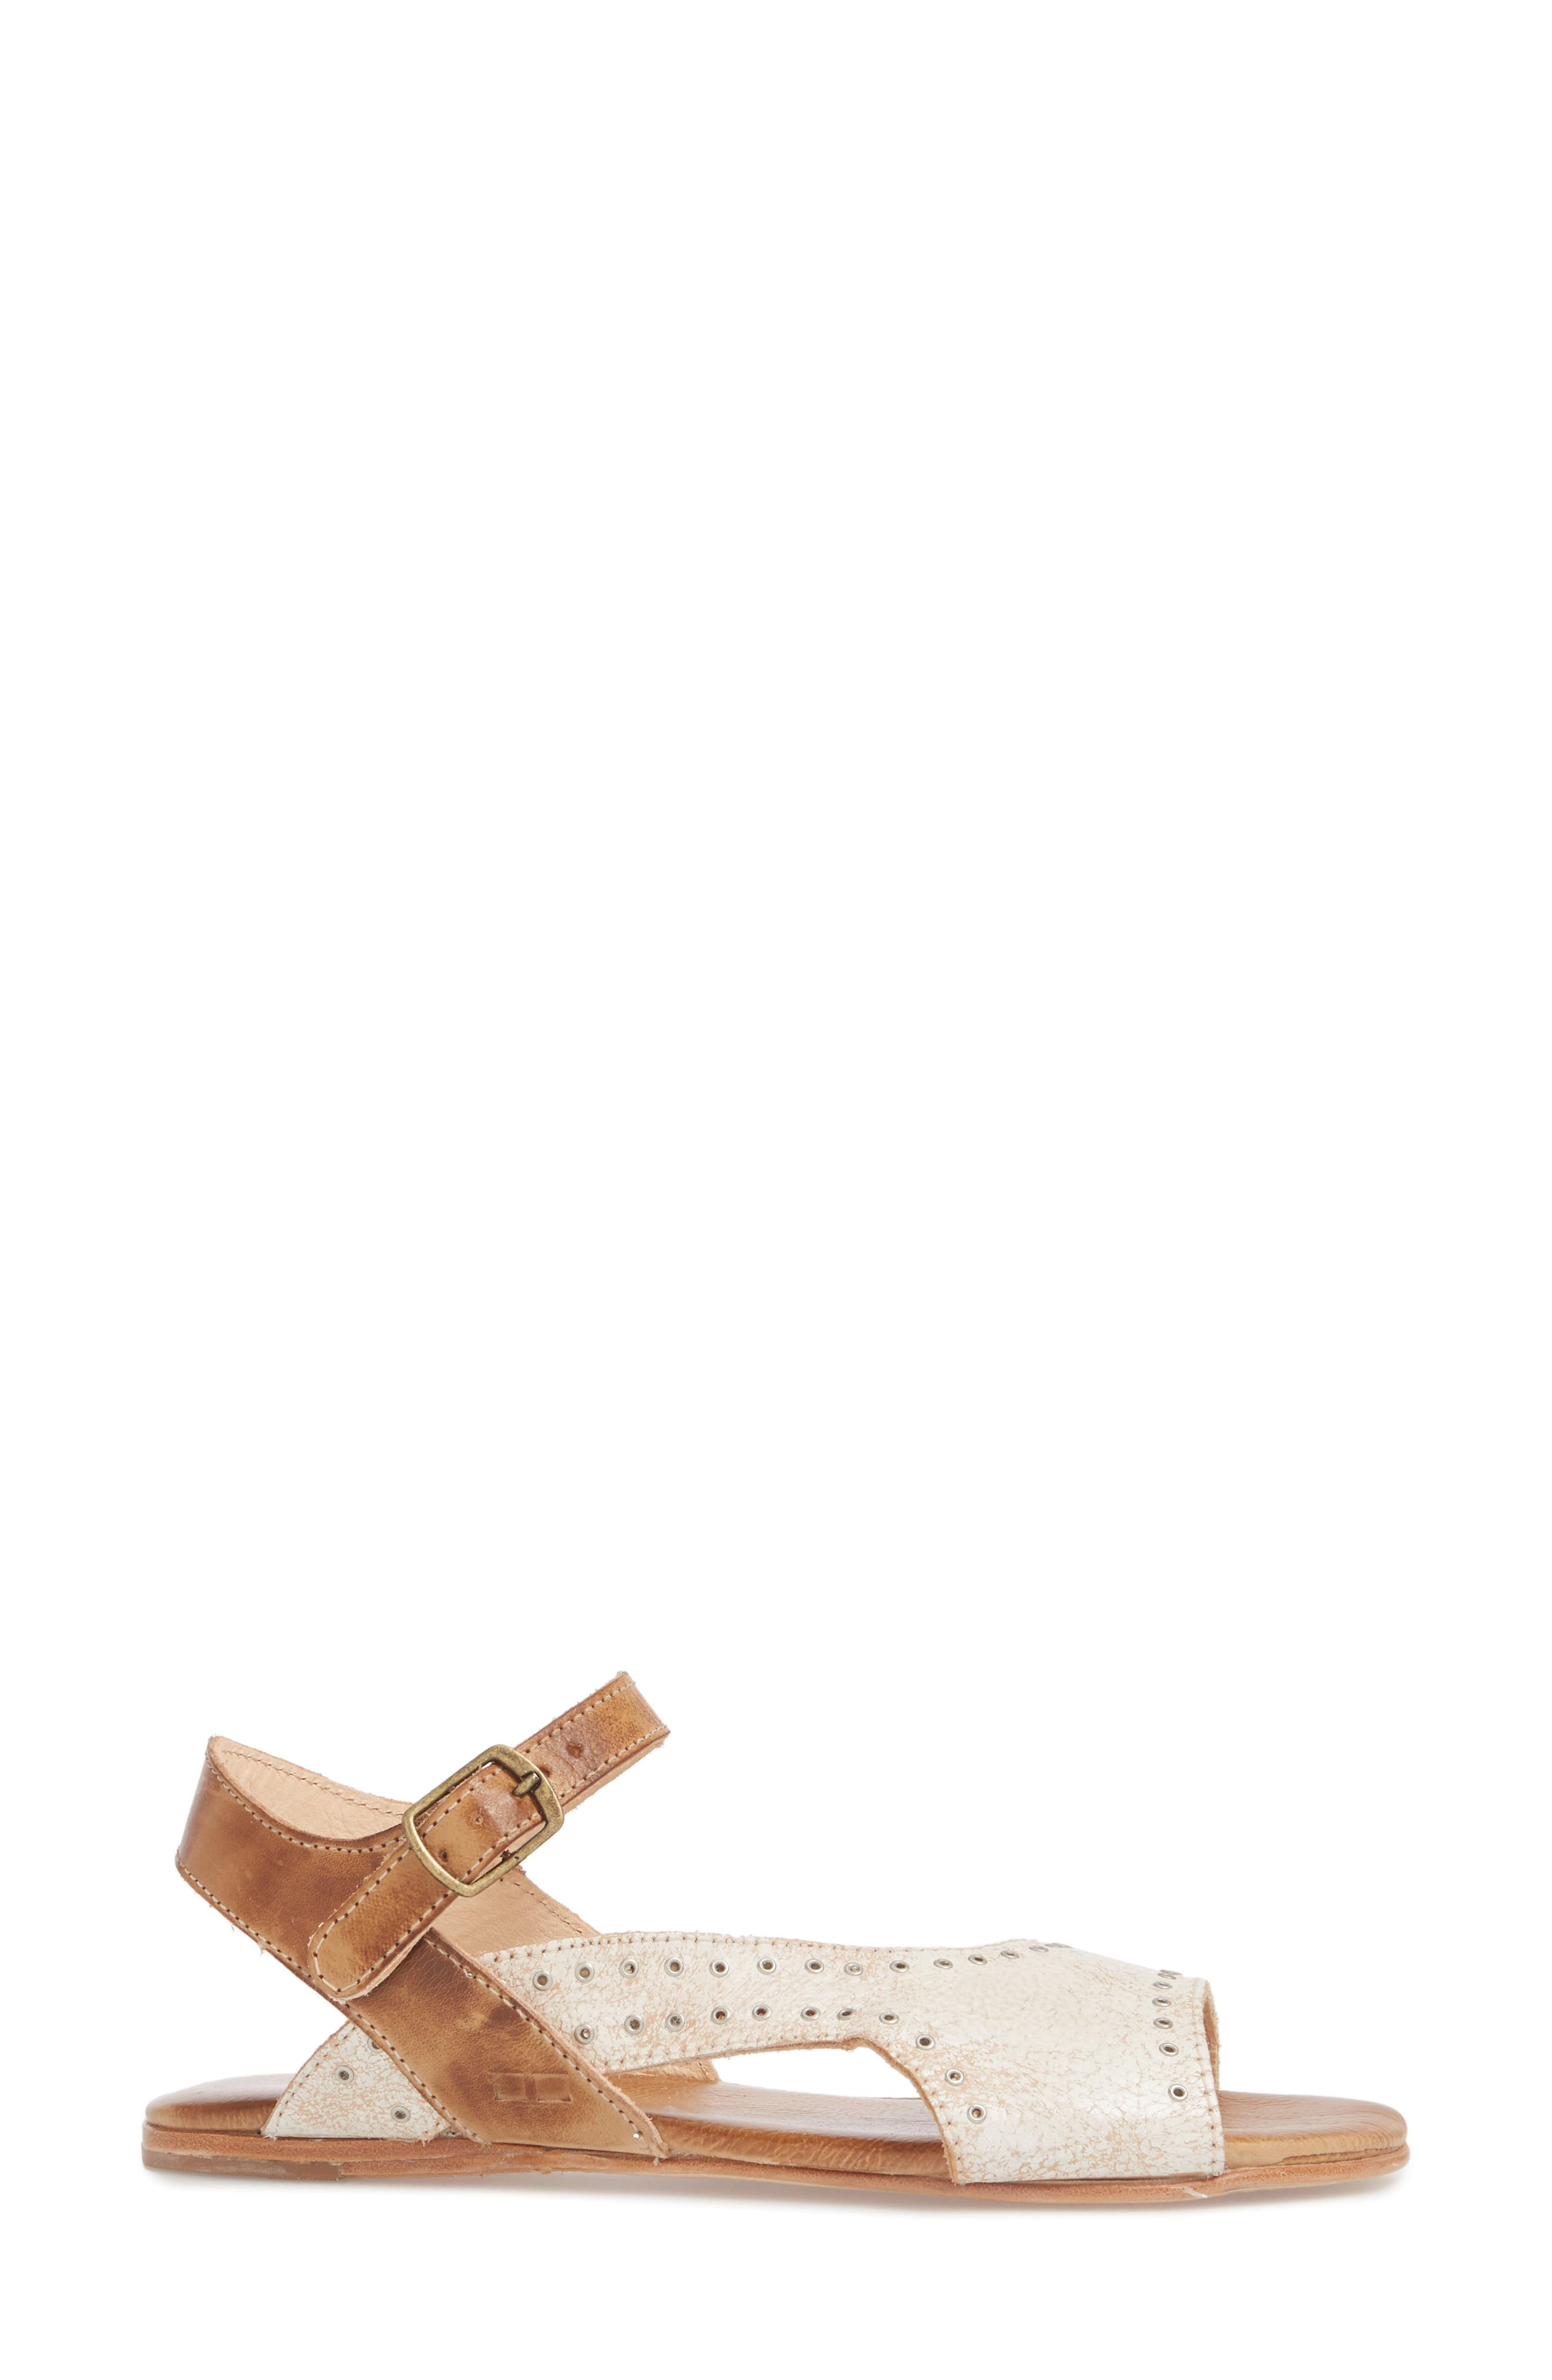 Auburn Flat Sandal,                             Alternate thumbnail 3, color,                             Nectar/ Tan Leather